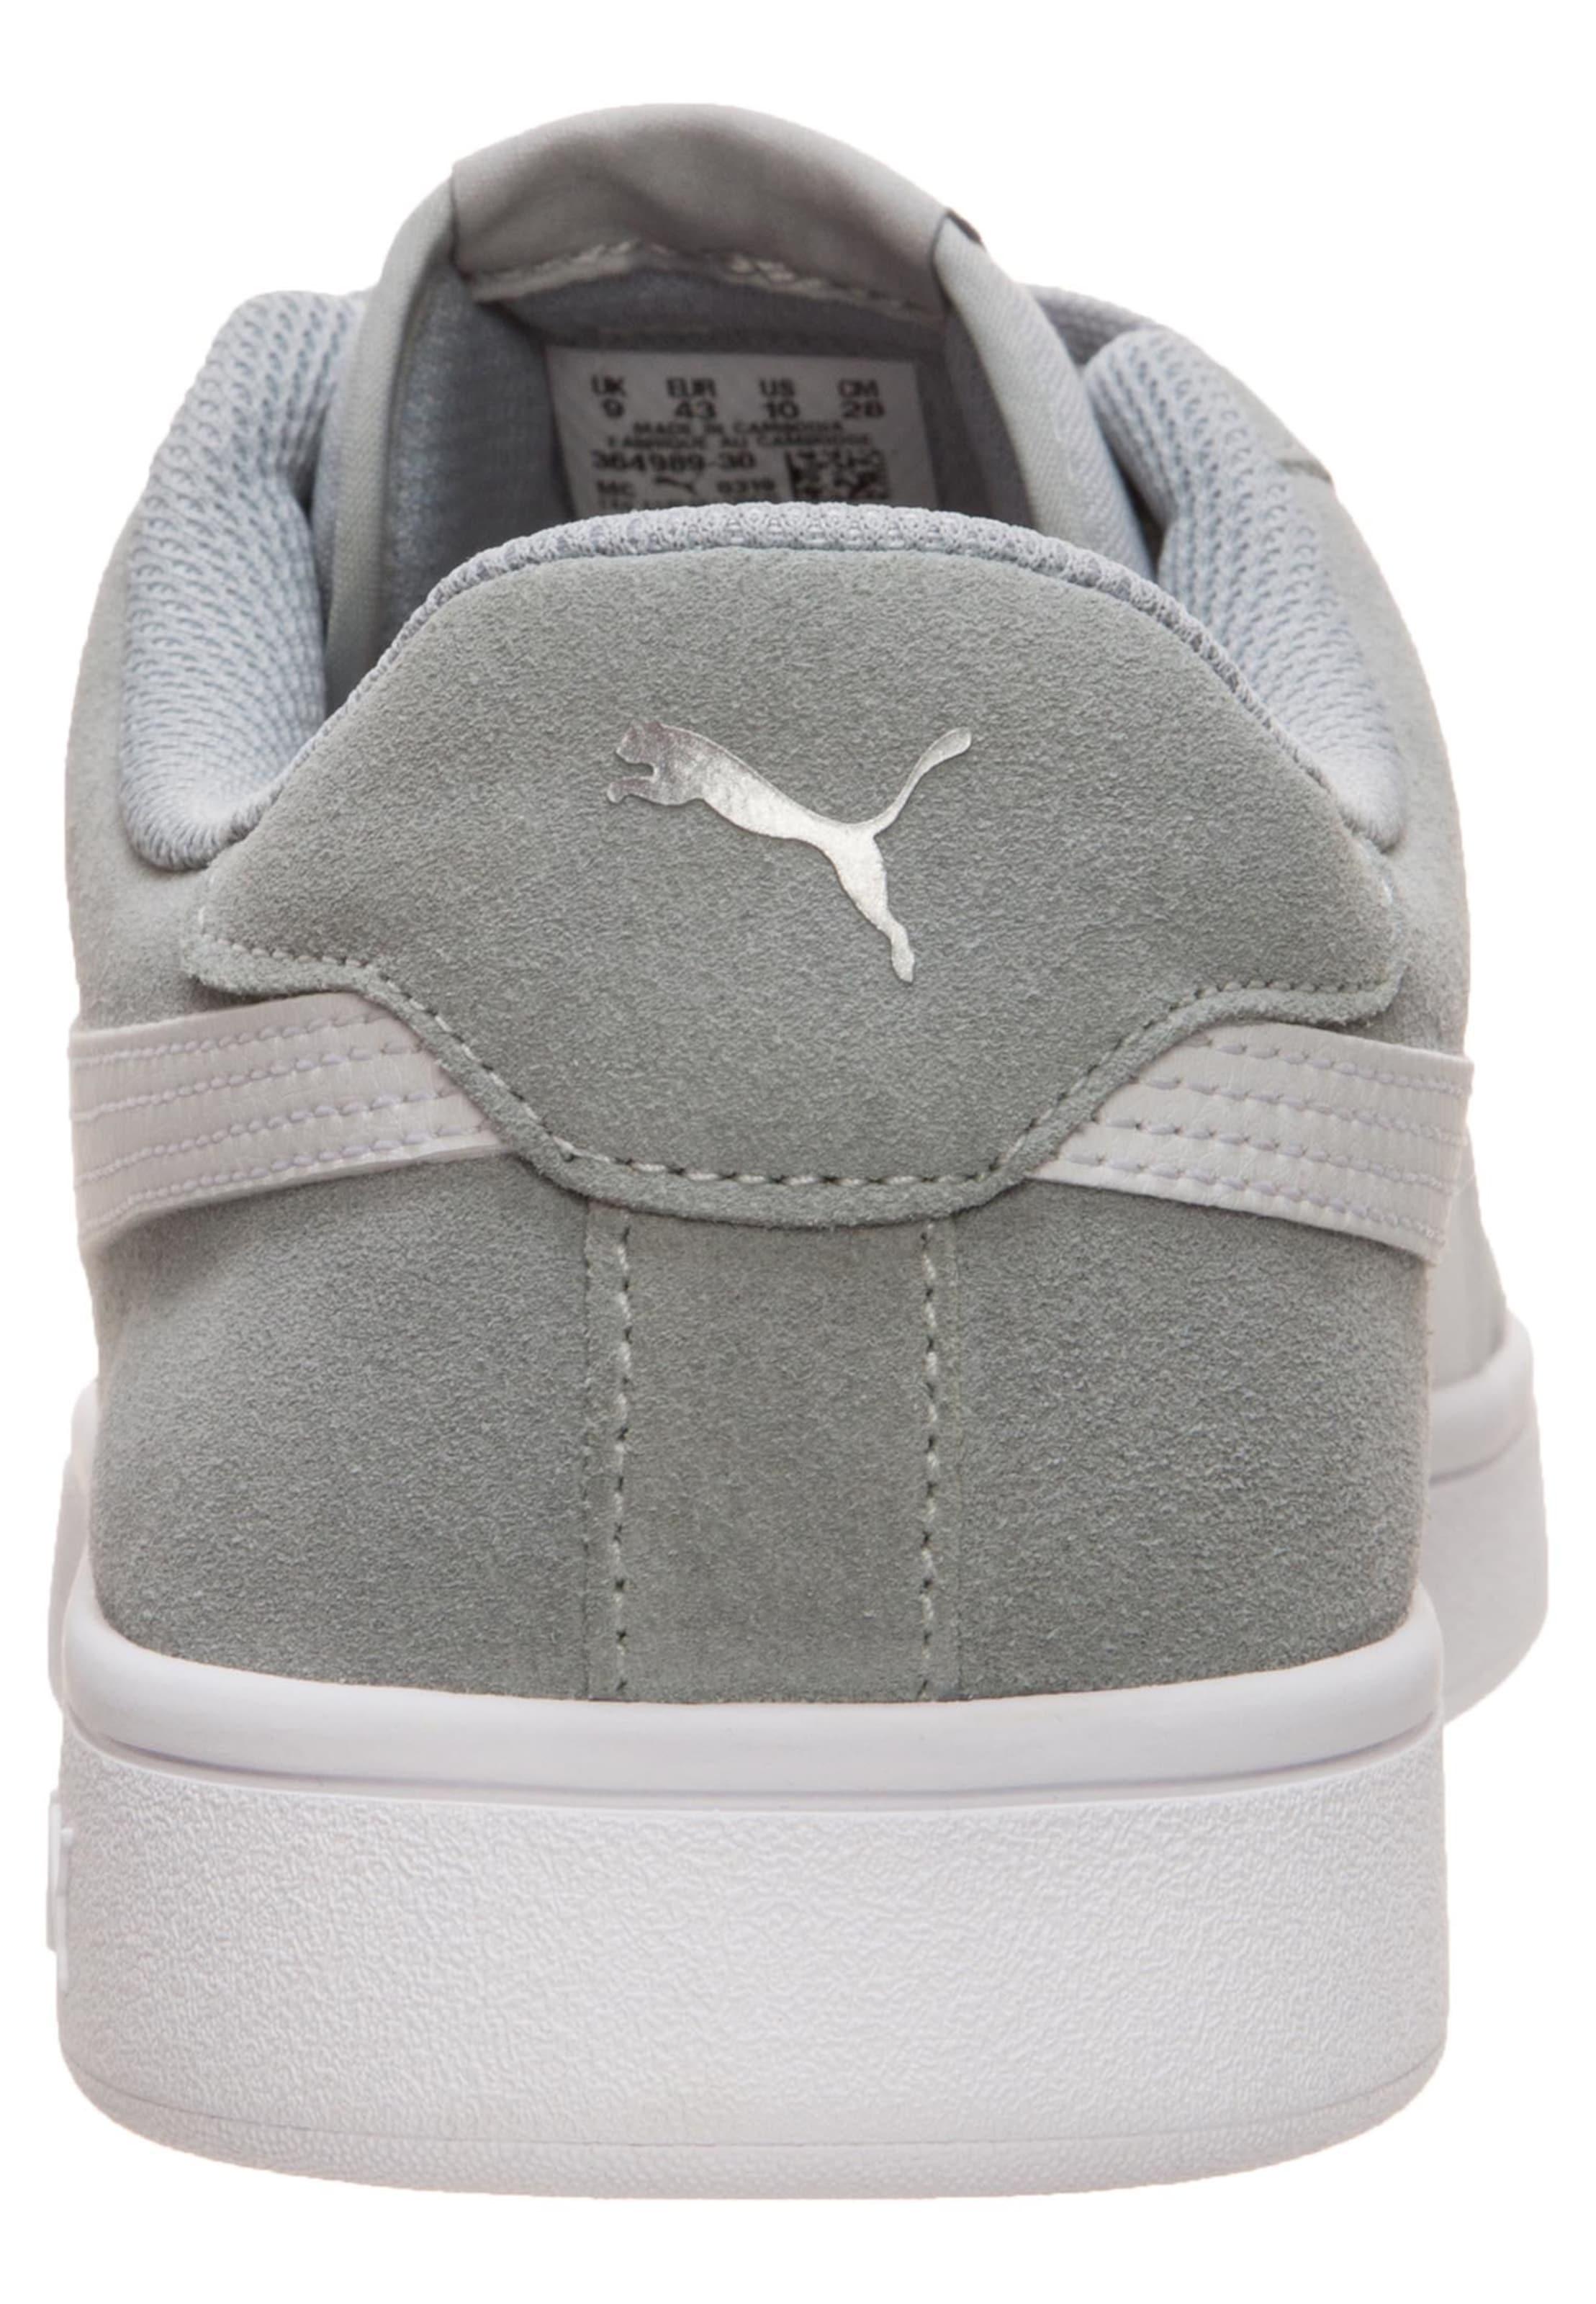 'smash In GrauWeiß V2' Sneaker Puma 1TclF3KJ